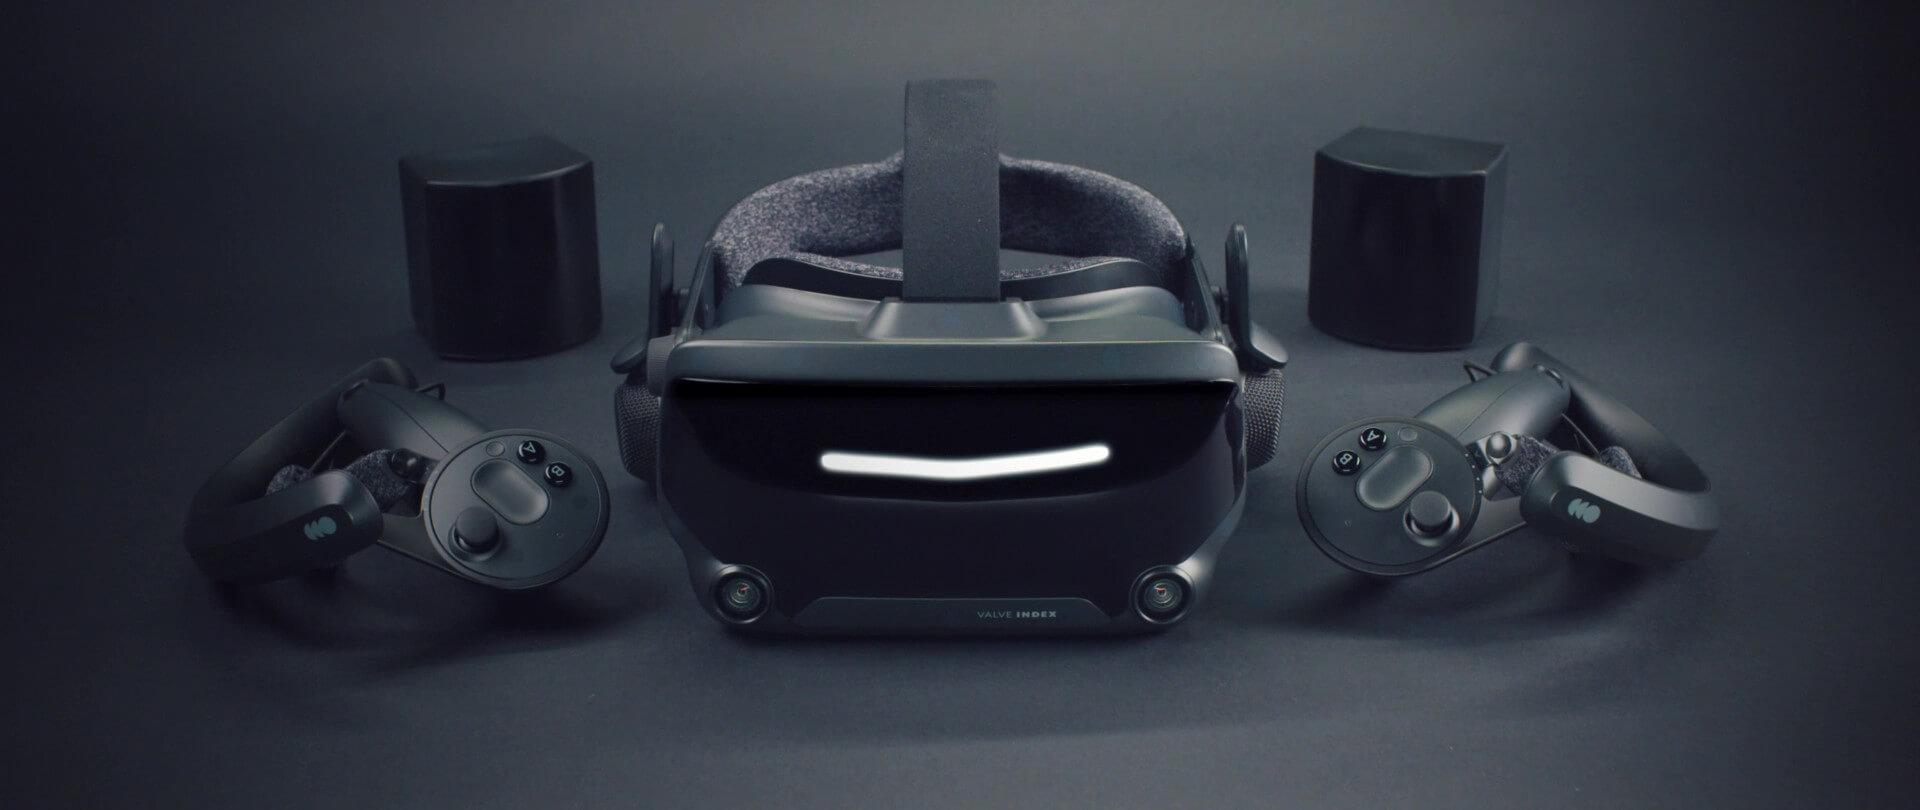 Valve's Index VR headset goes back on sale March 9   VentureBeat